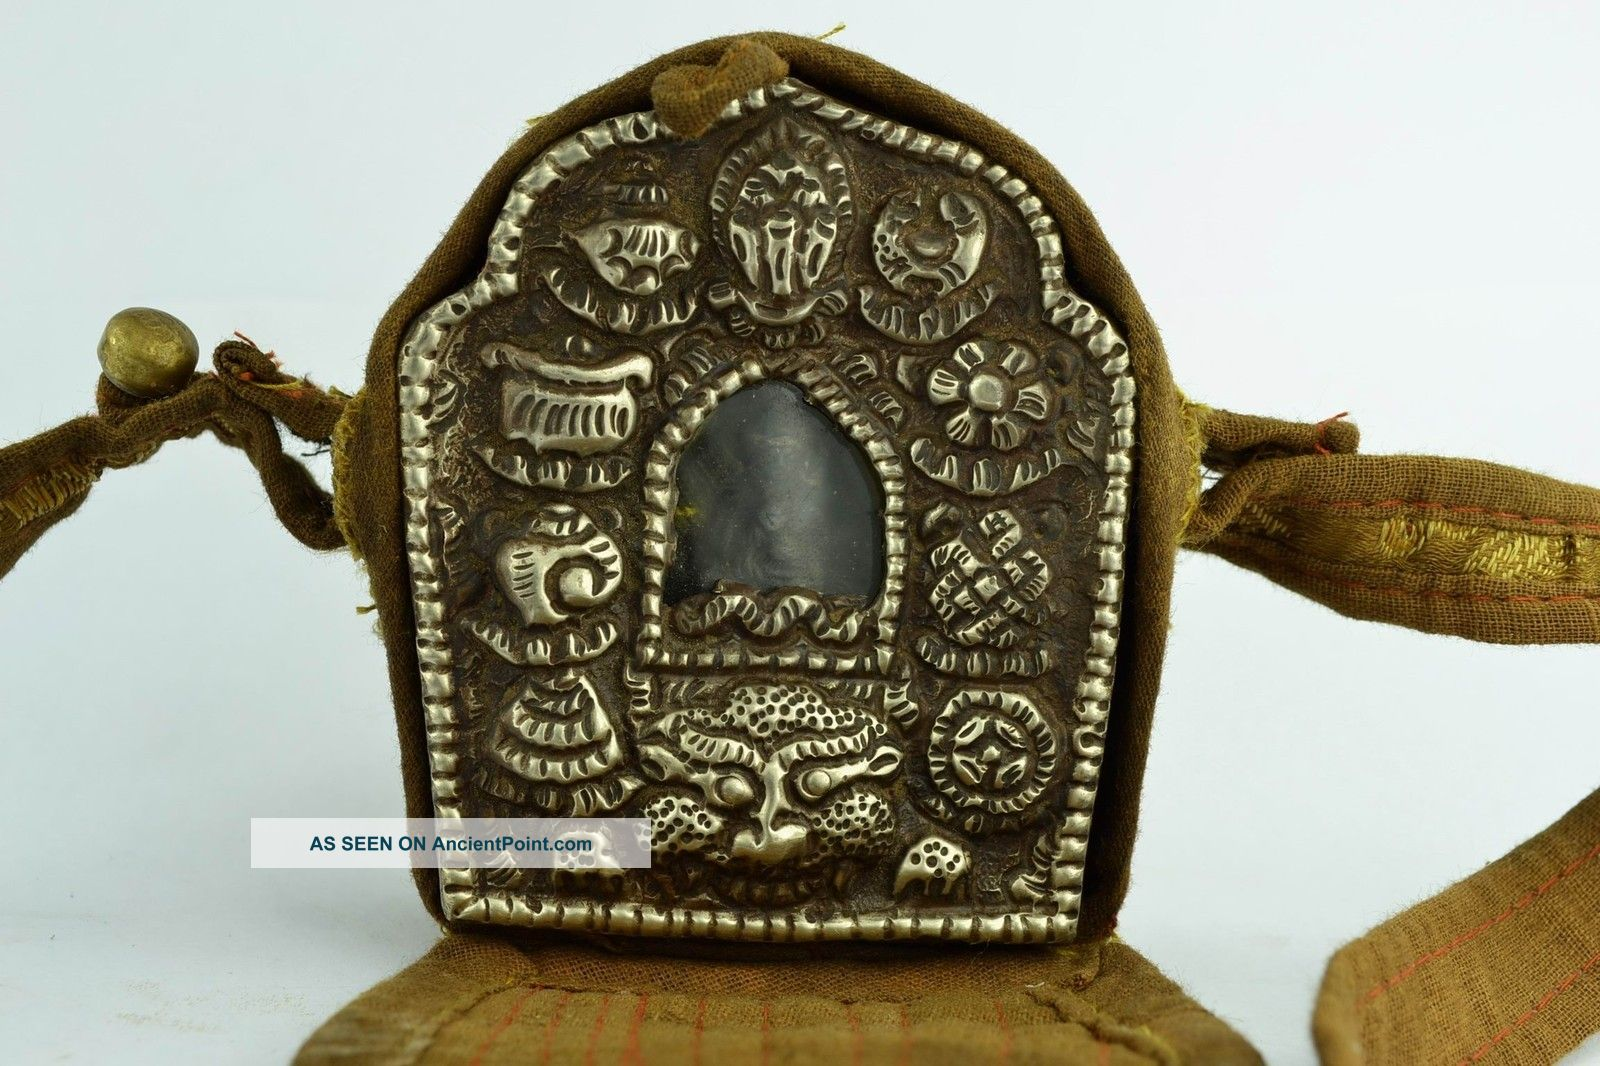 Asian Old Collectibles Decorated Wonderful Handwork Copper Buddha Statue Aaaaa Buddha photo